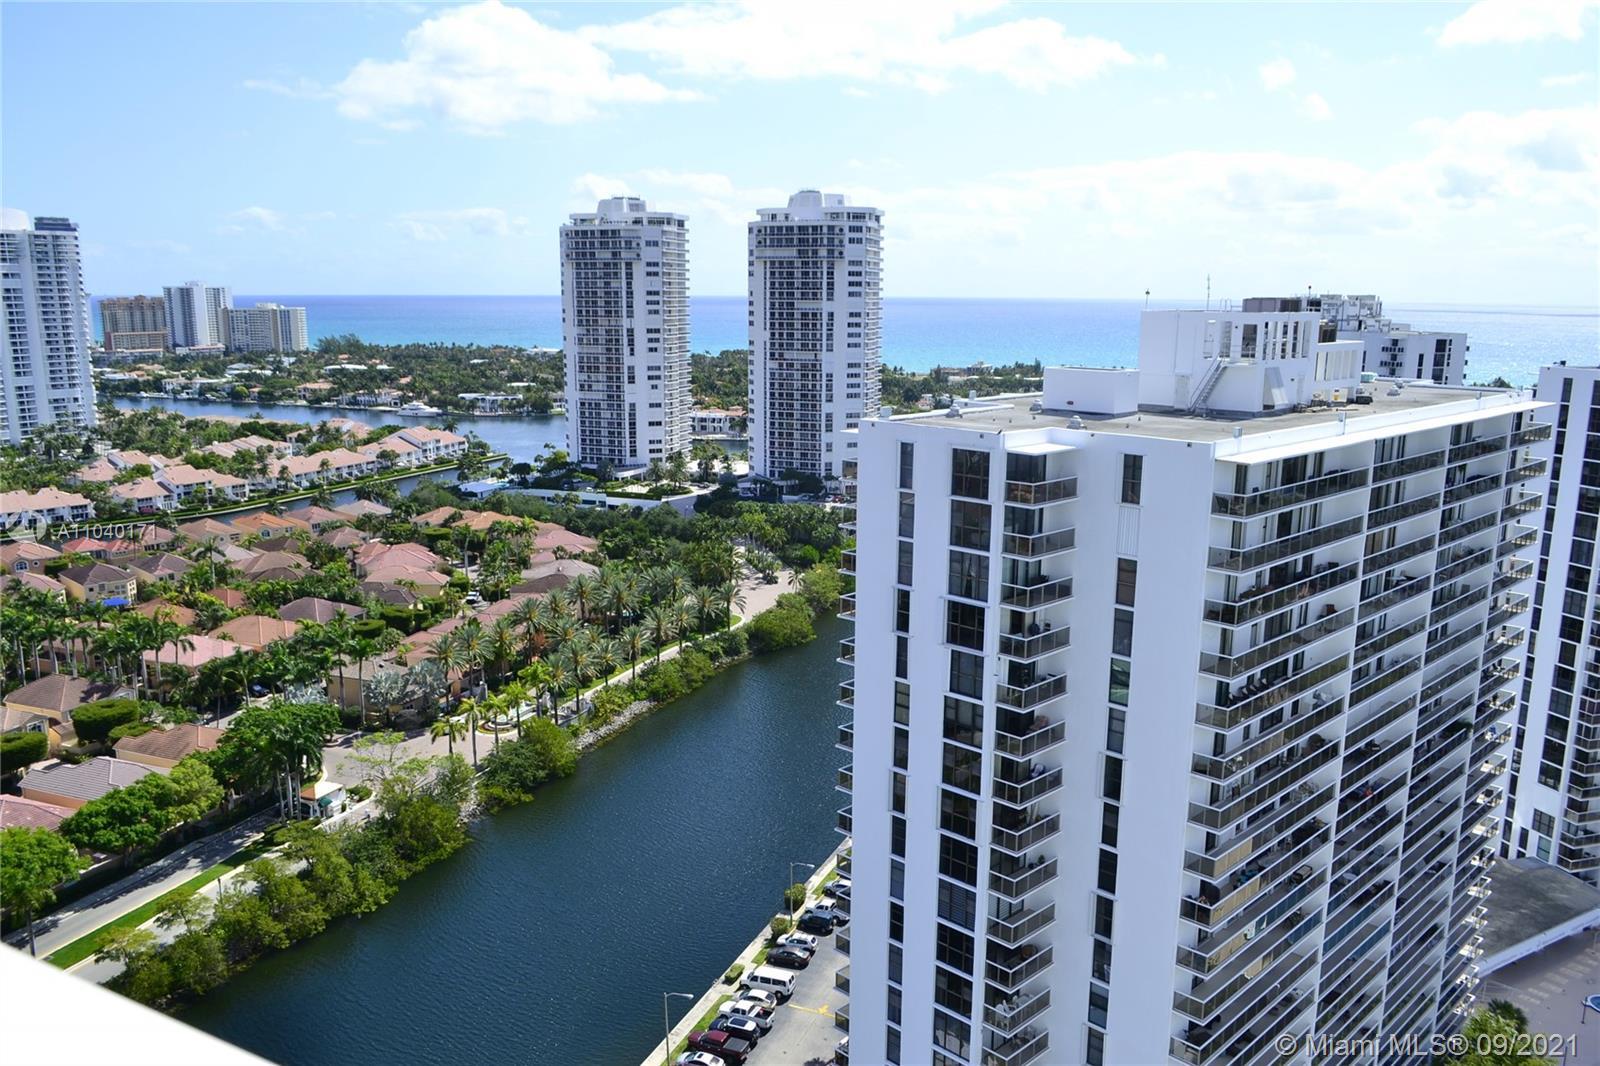 Eldorado Tower Two #2601 - 3675 N Country Club Dr #2601, Aventura, FL 33180